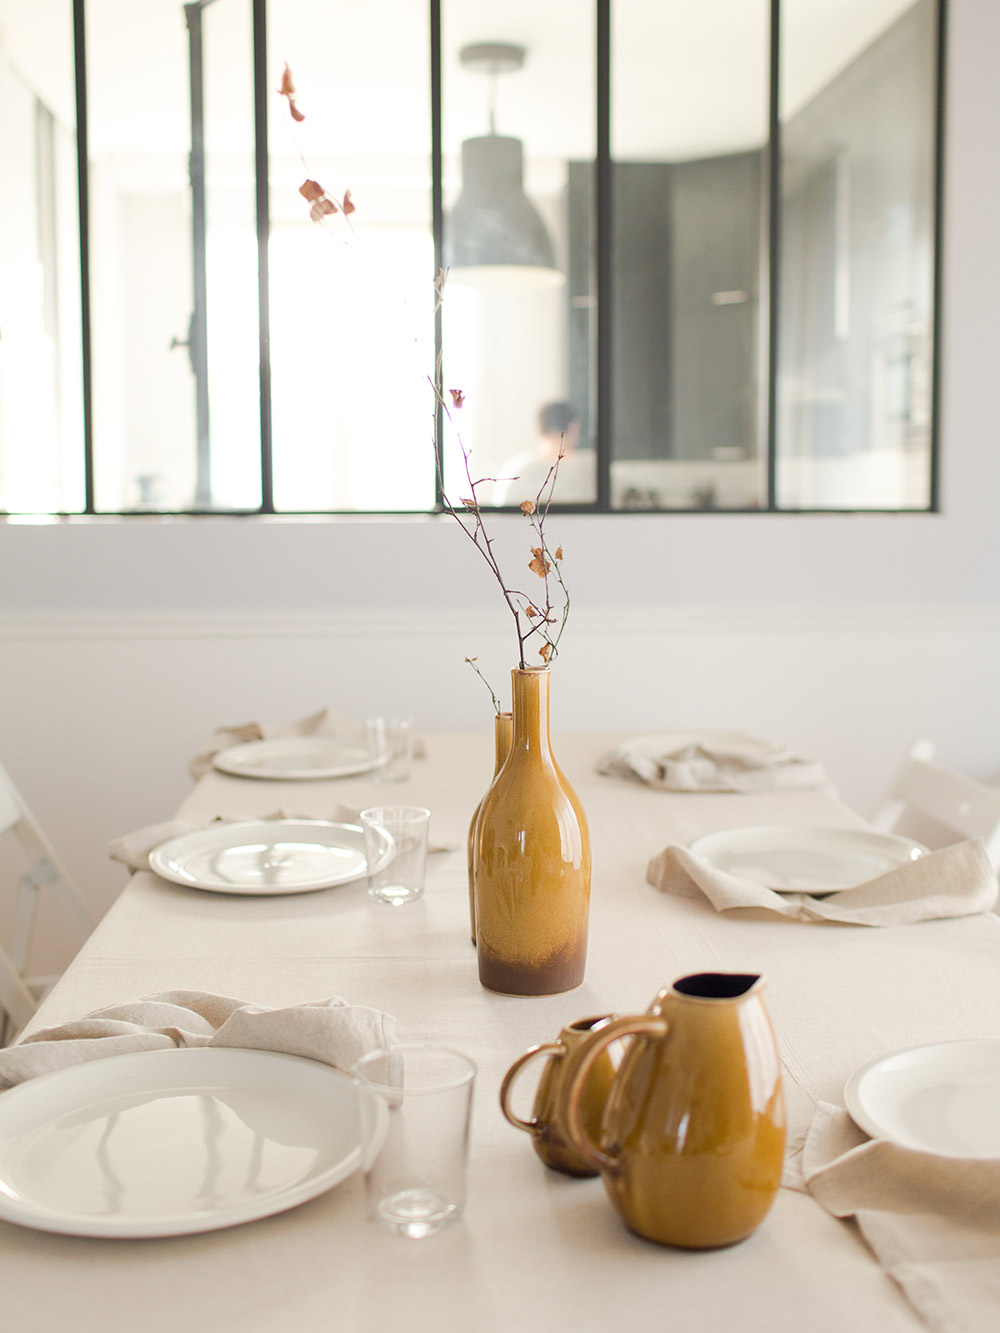 Blanccoco_Photographe_Naked_Styliste_Culinaire_Food_Stylist-13